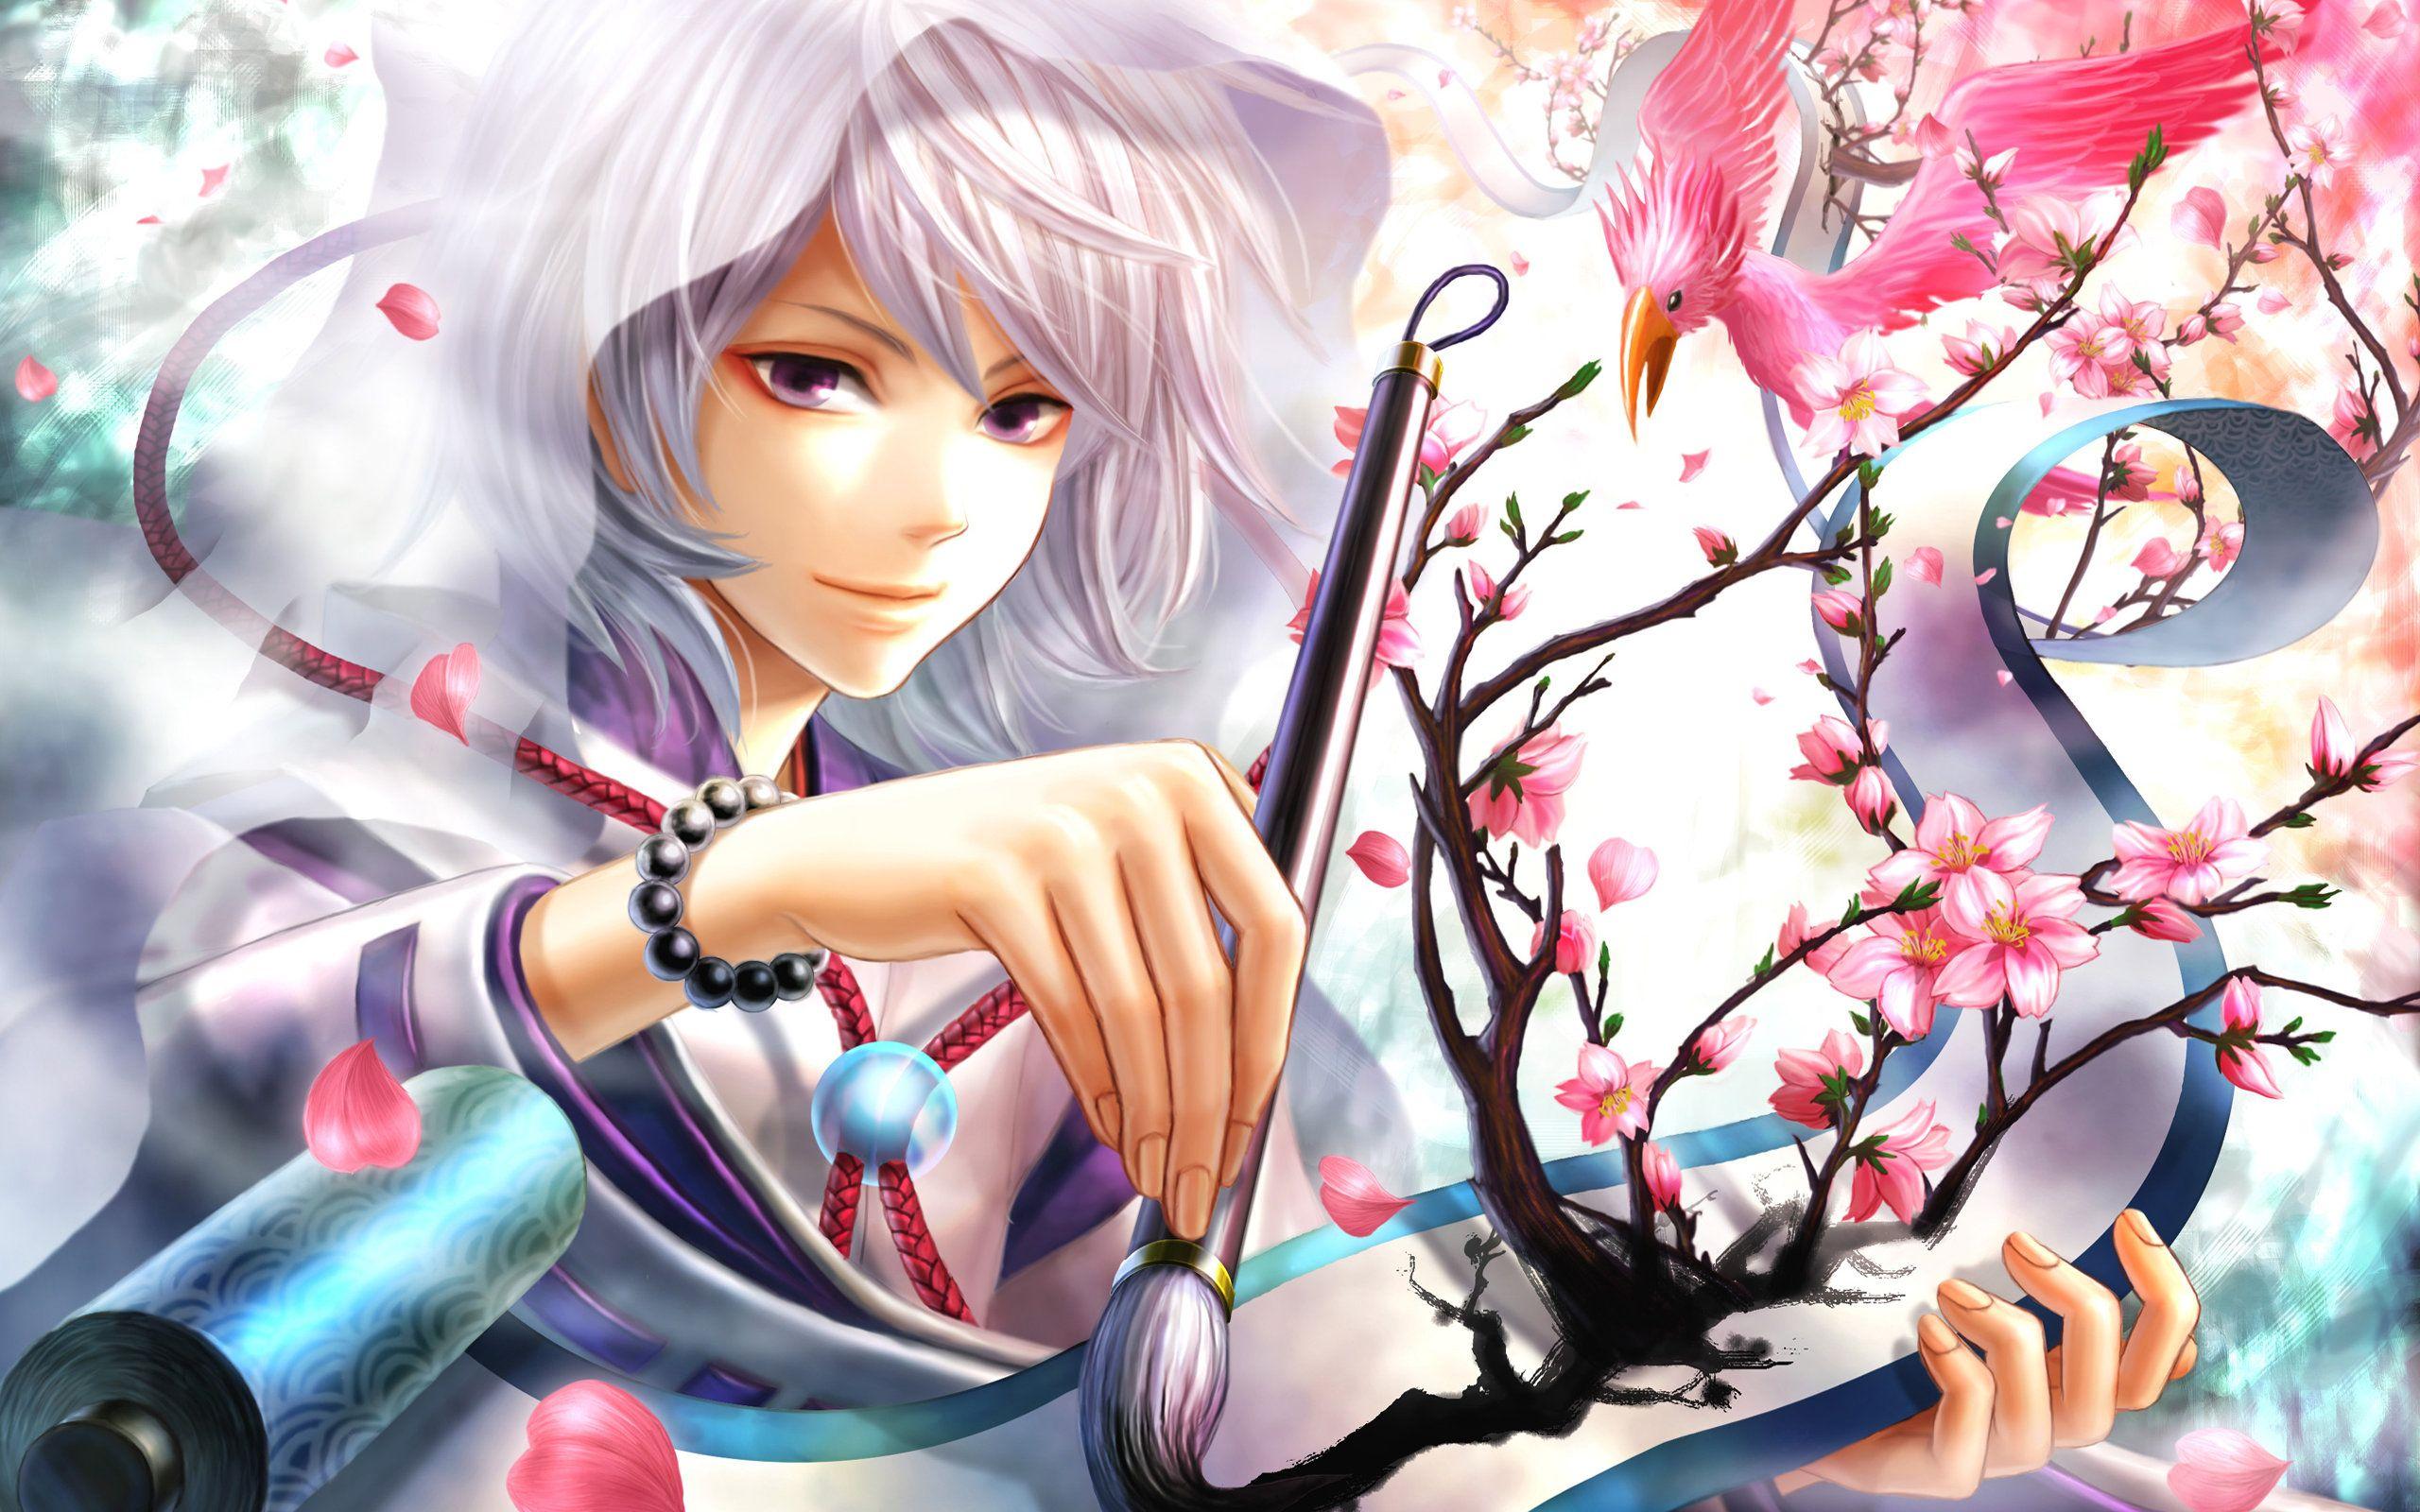 Download Anime Screensavers 21698 2560x1600 px High